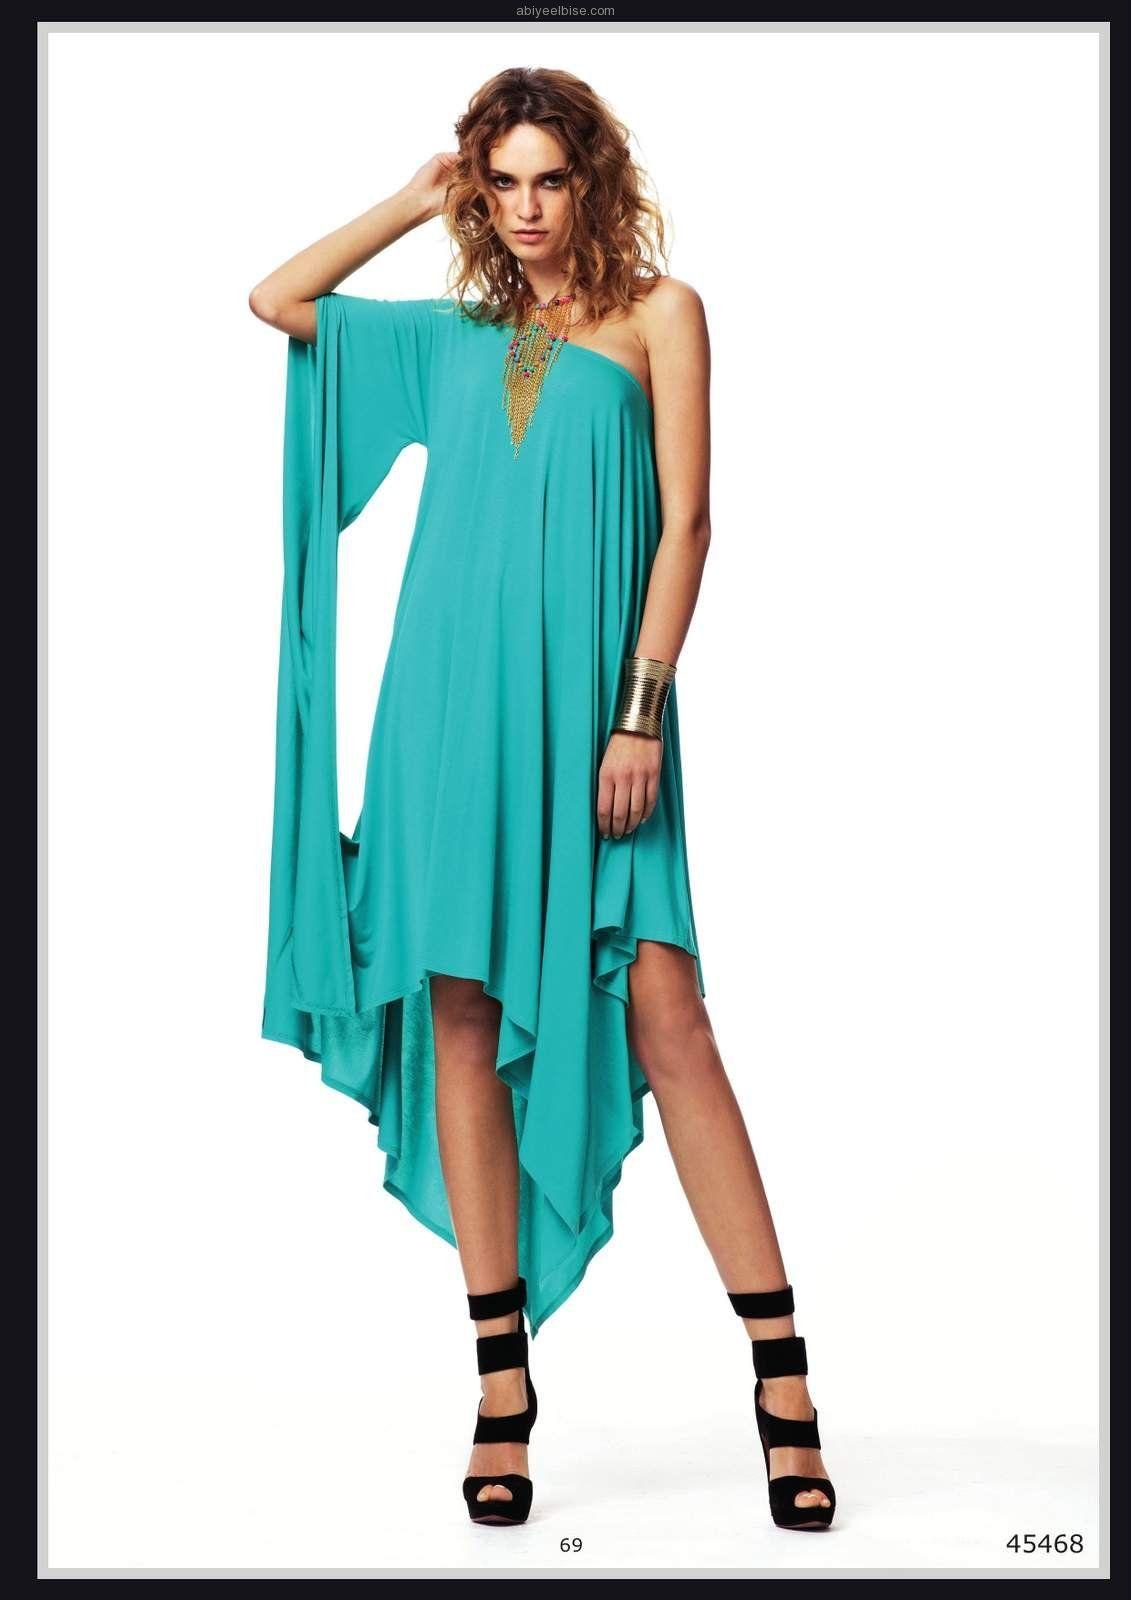 Bayanlar Com Tr Adli Kullanicinin Kate S Cocktail Dresses Panosundaki Pin The Dress Siyah Kisa Elbise Moda Stilleri